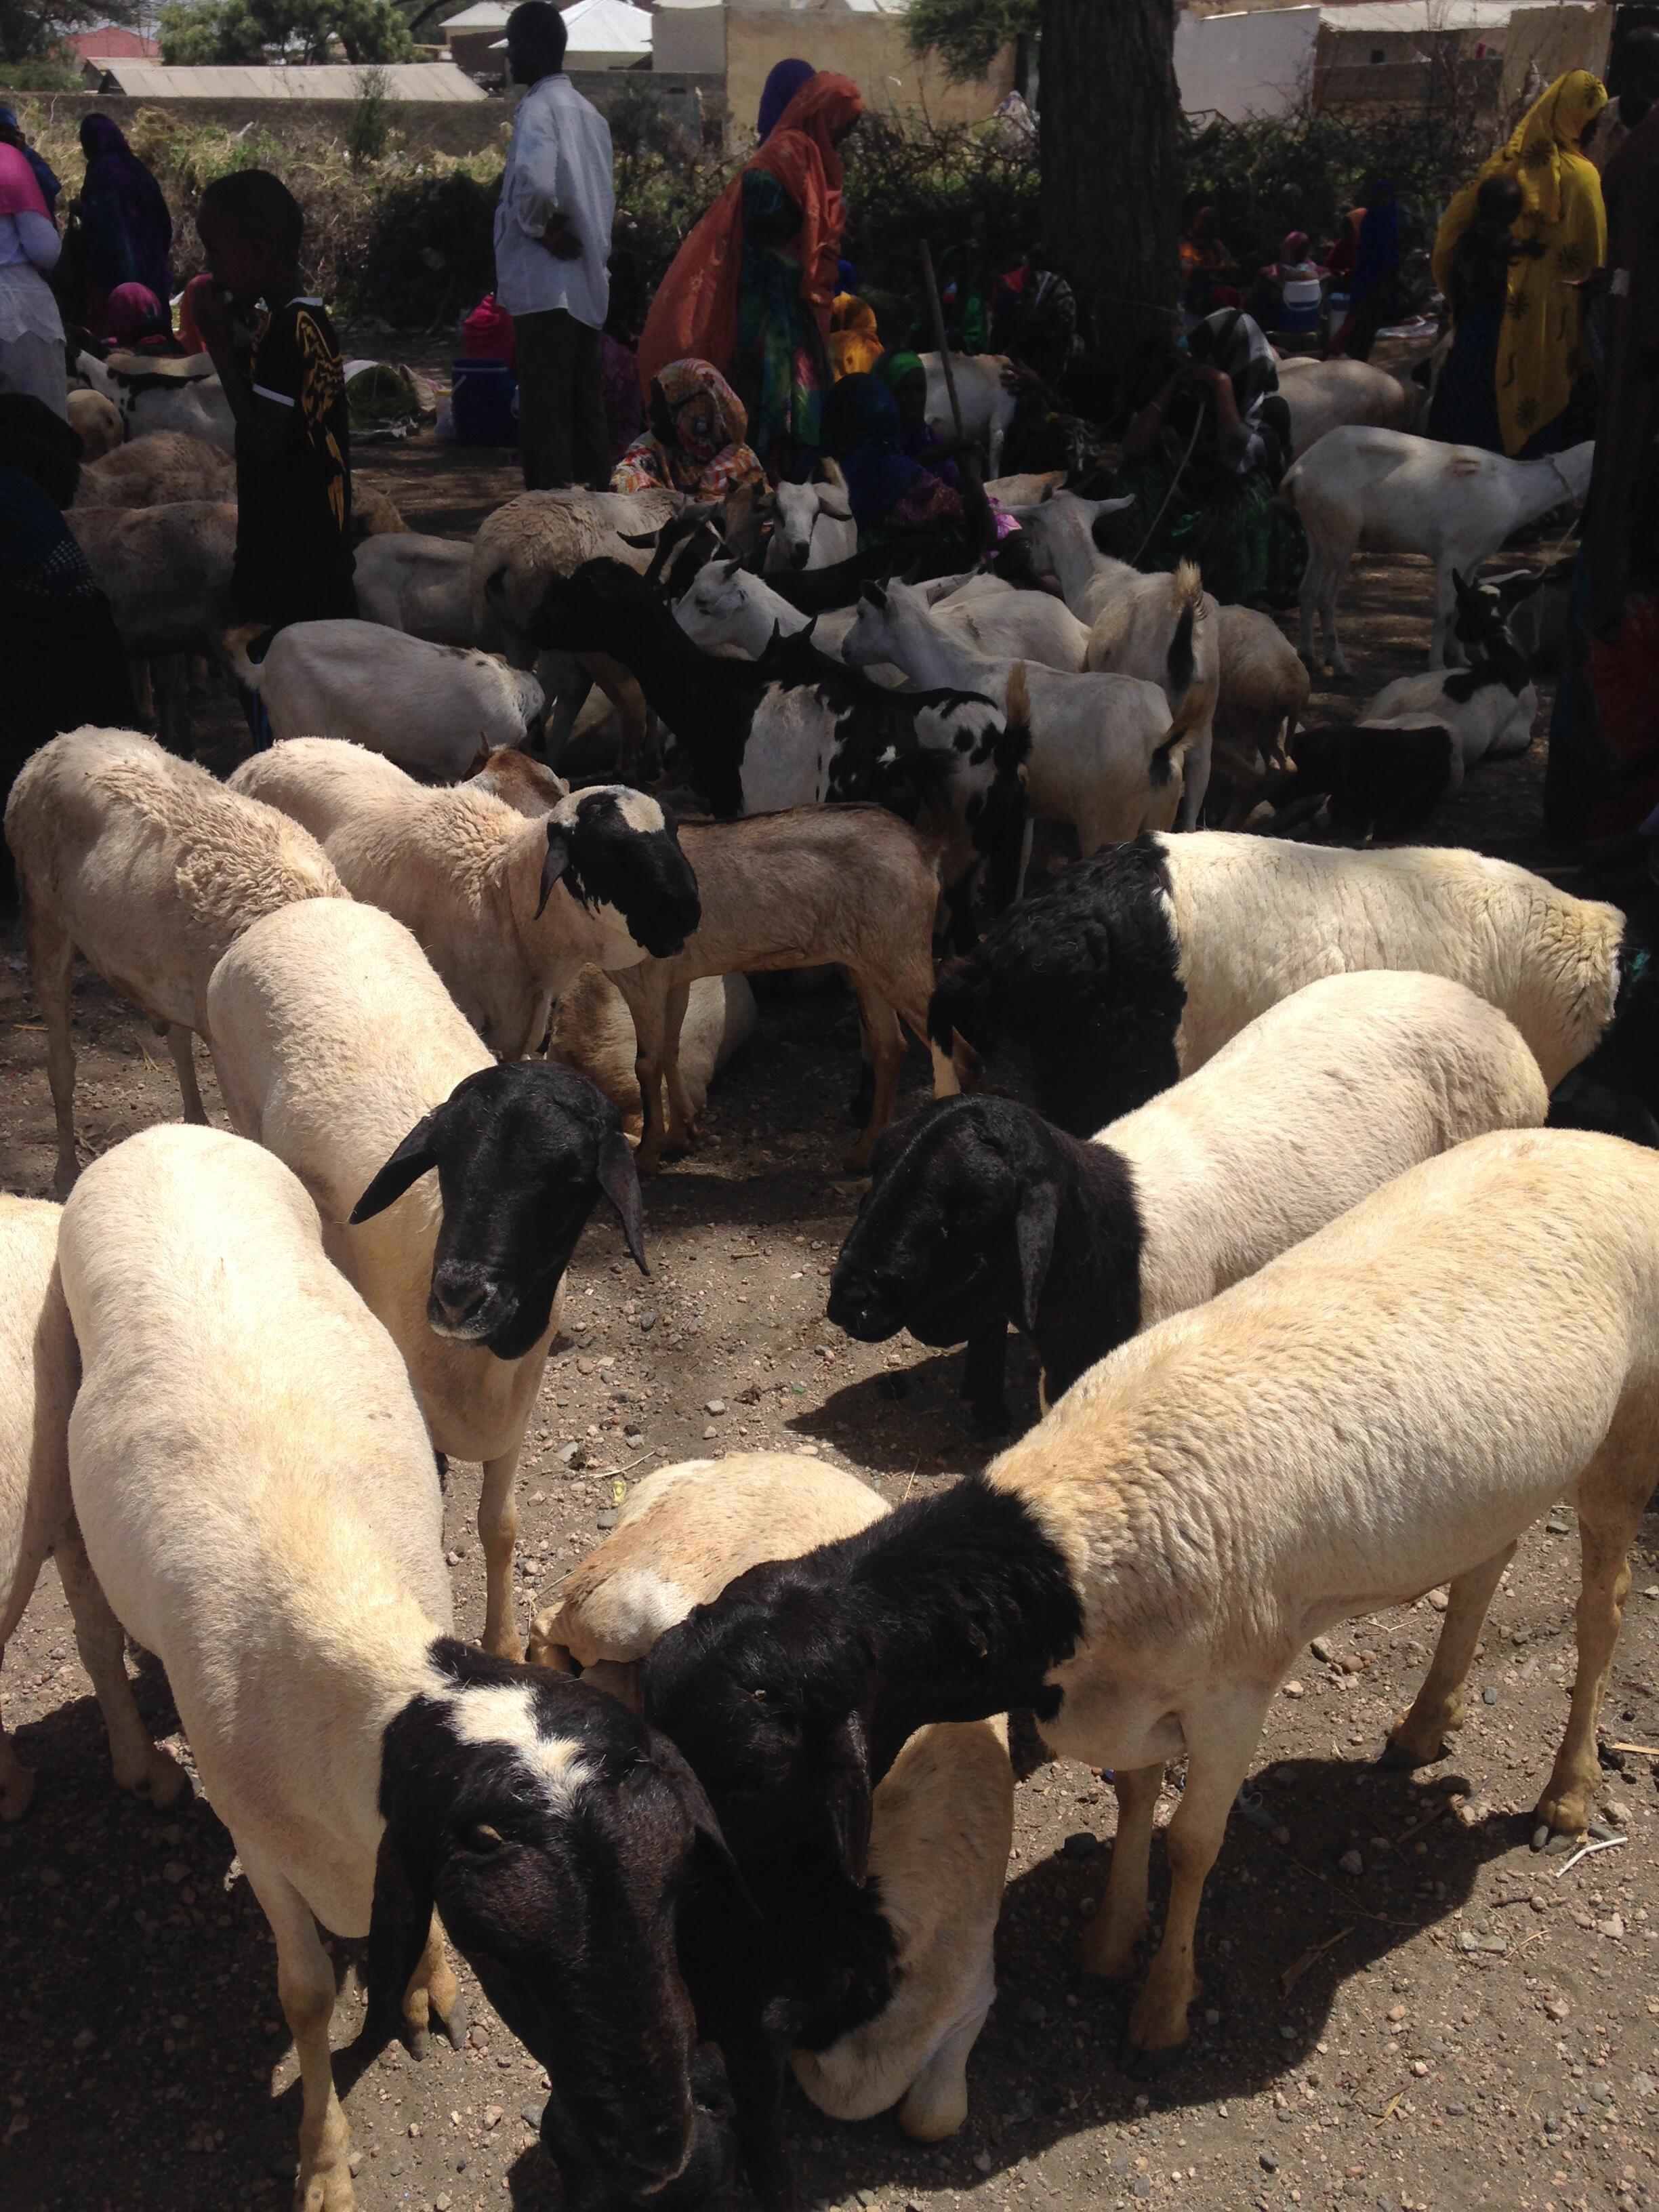 Somaliland blackhead sheep mingle with goats at the market in Borama, Somaliland